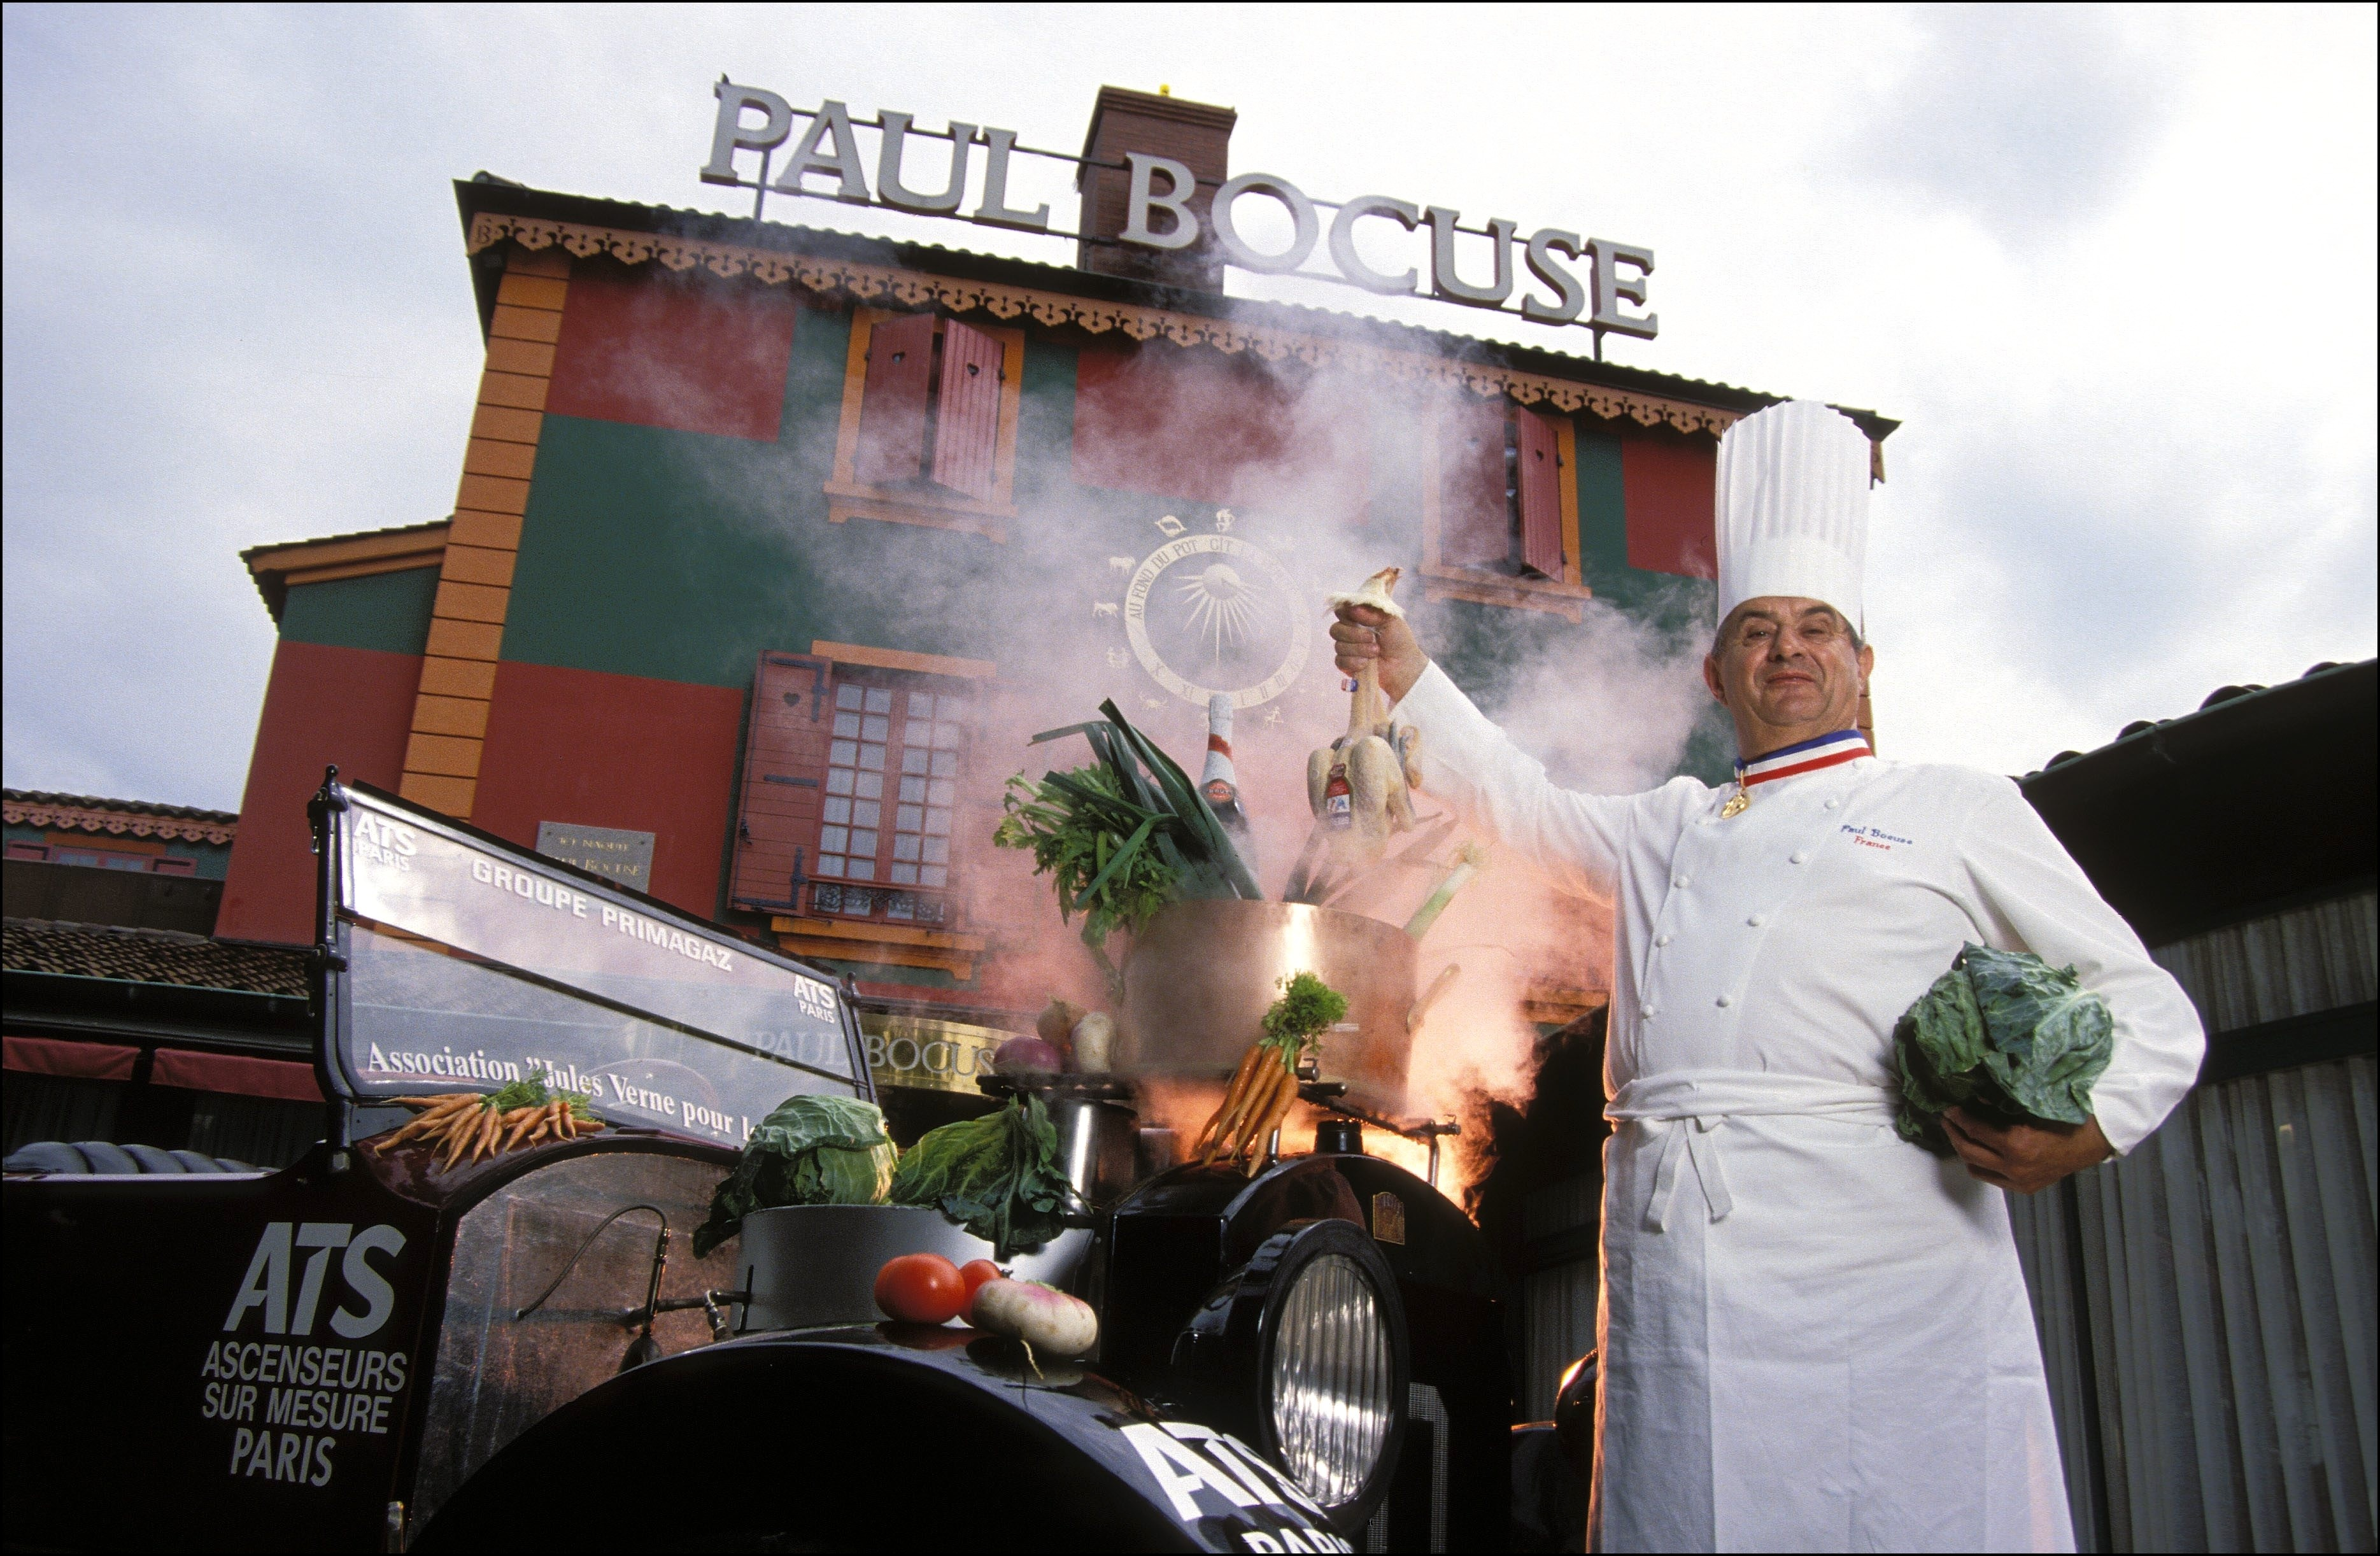 Paul Bocuse standing in front of his namesake restaurant.